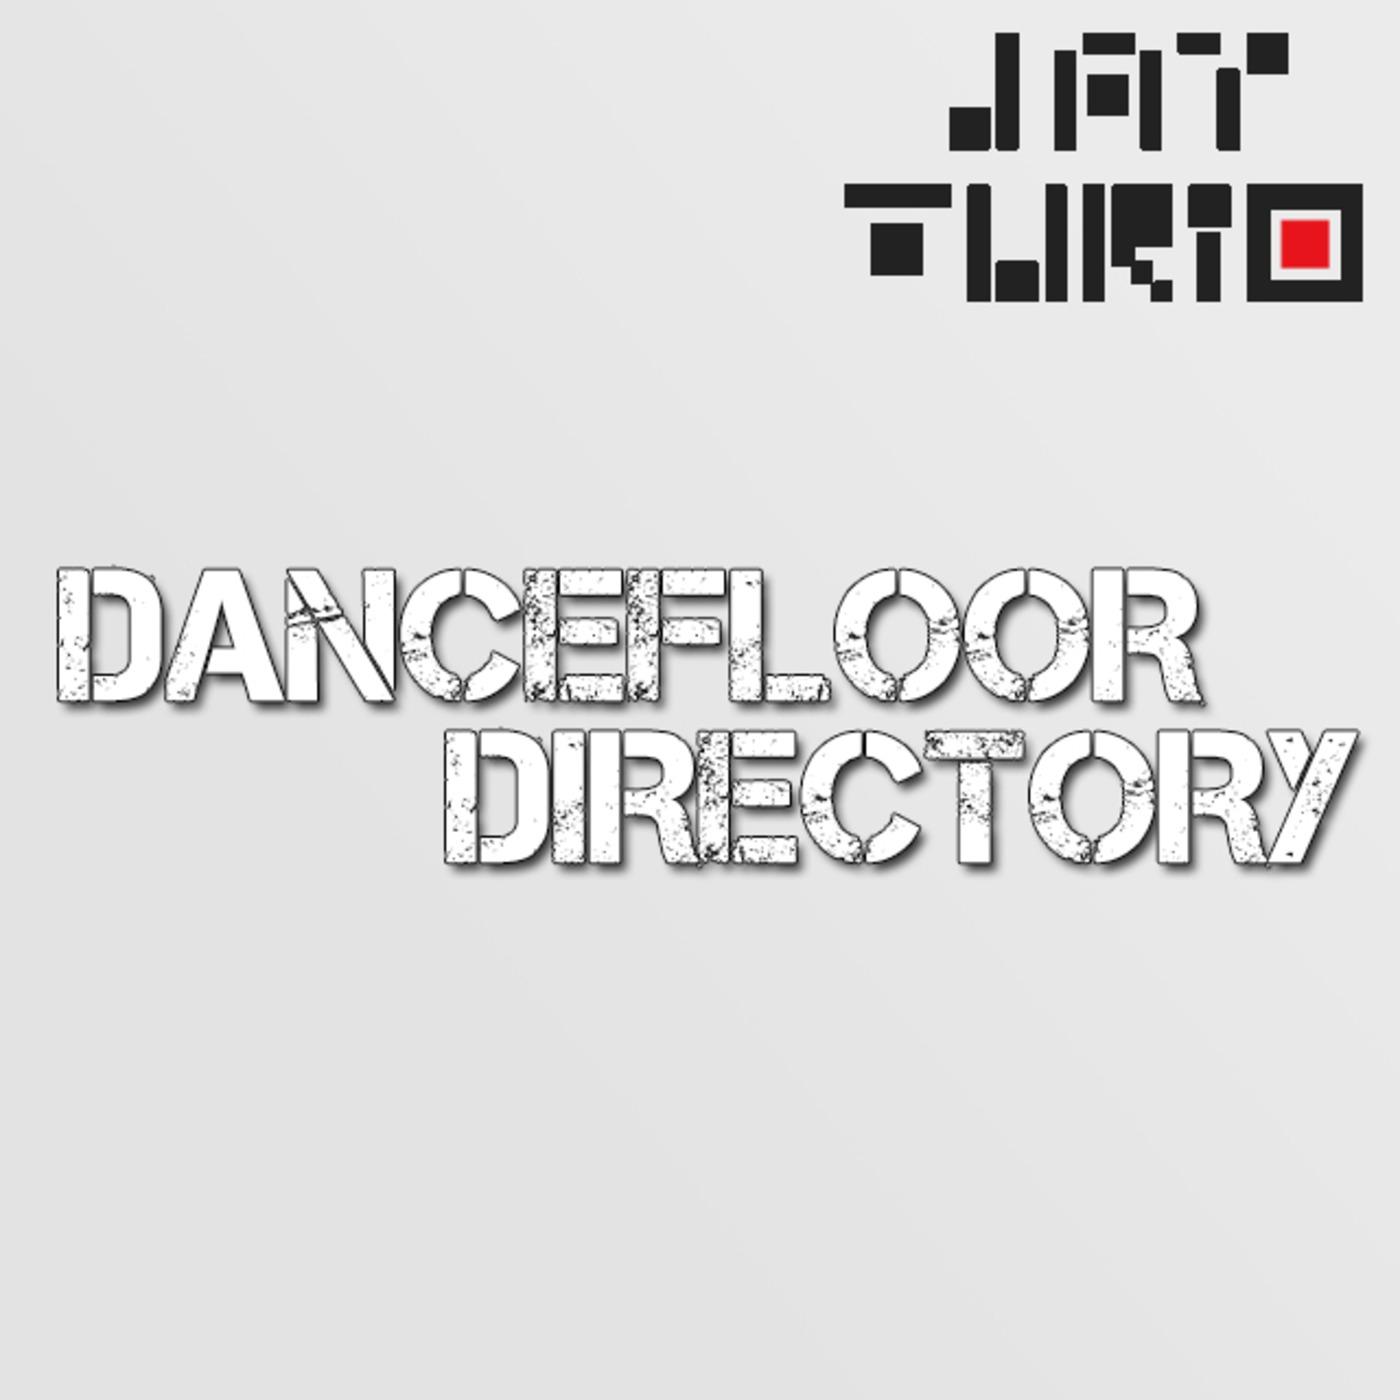 Jay Turio's Dancefloor Directory